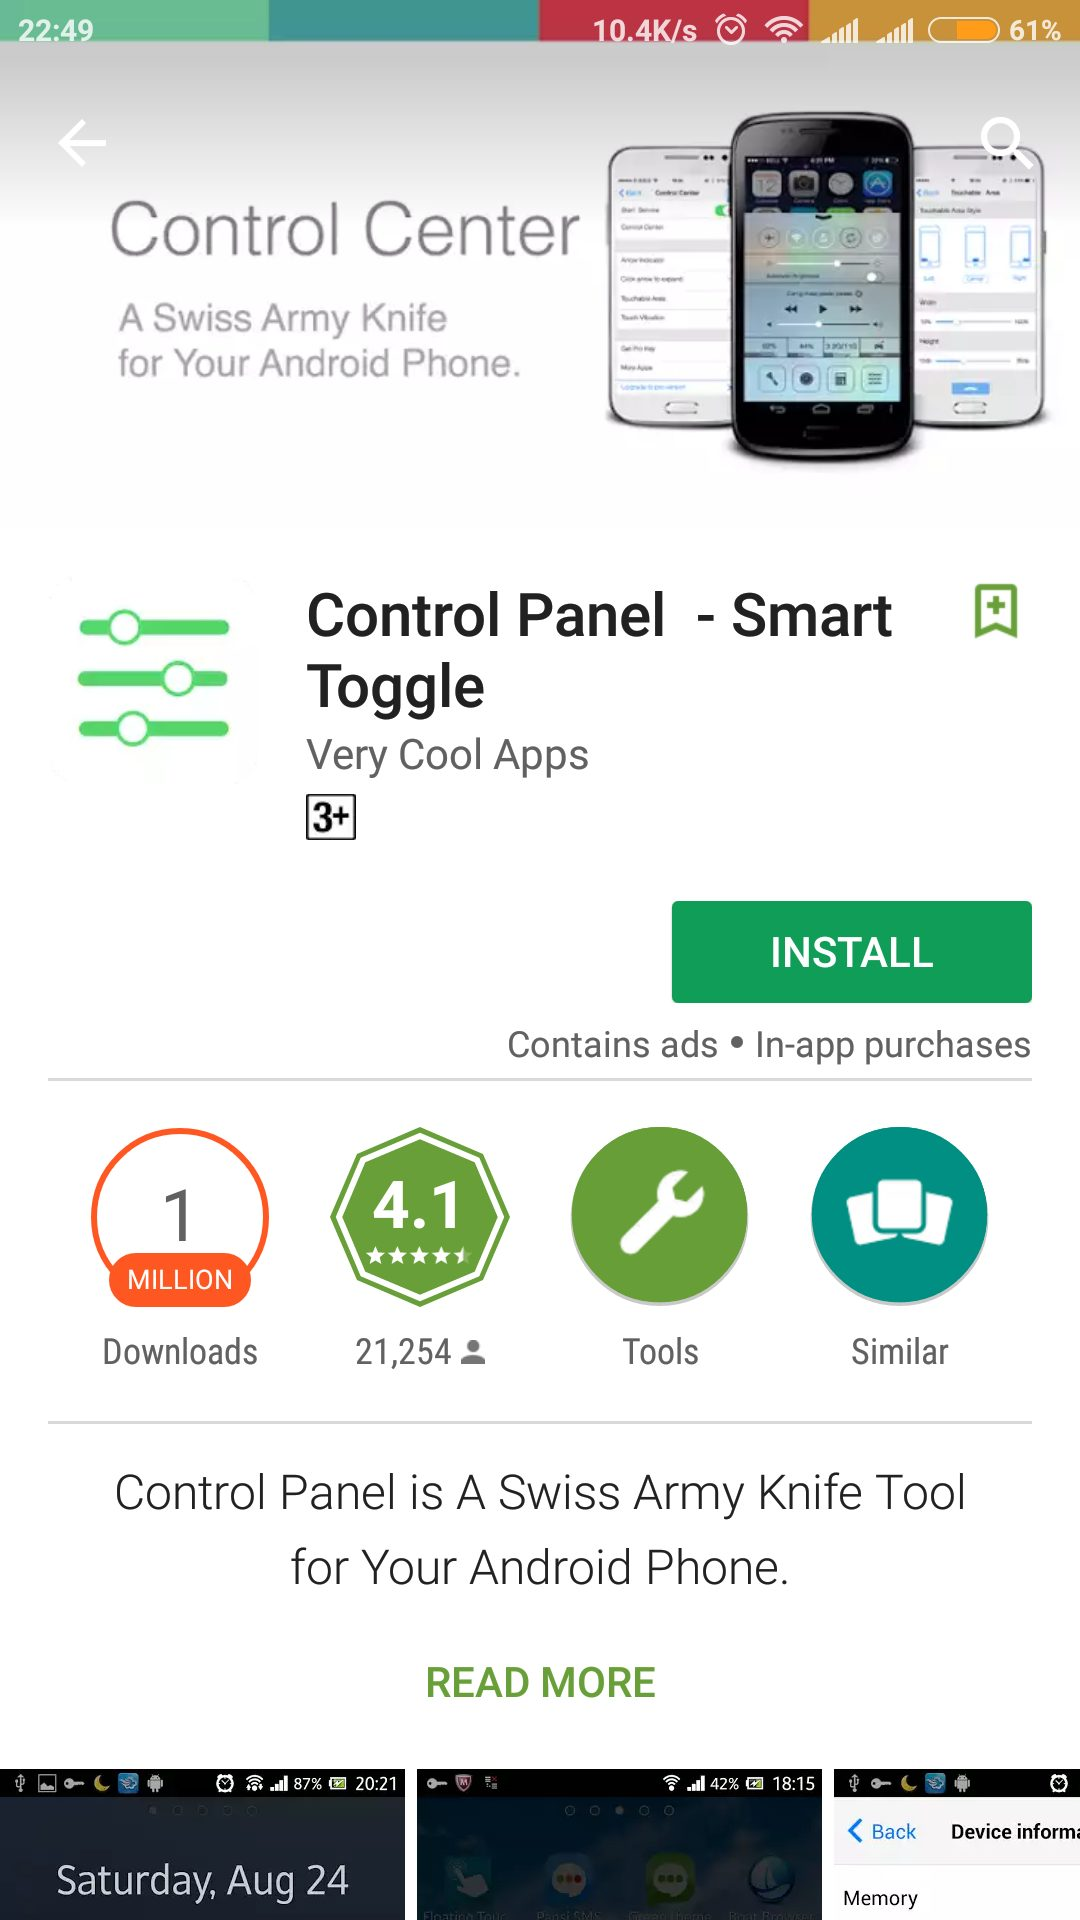 screenshot_2016-11-26-22-49-17-835_com-android-vending